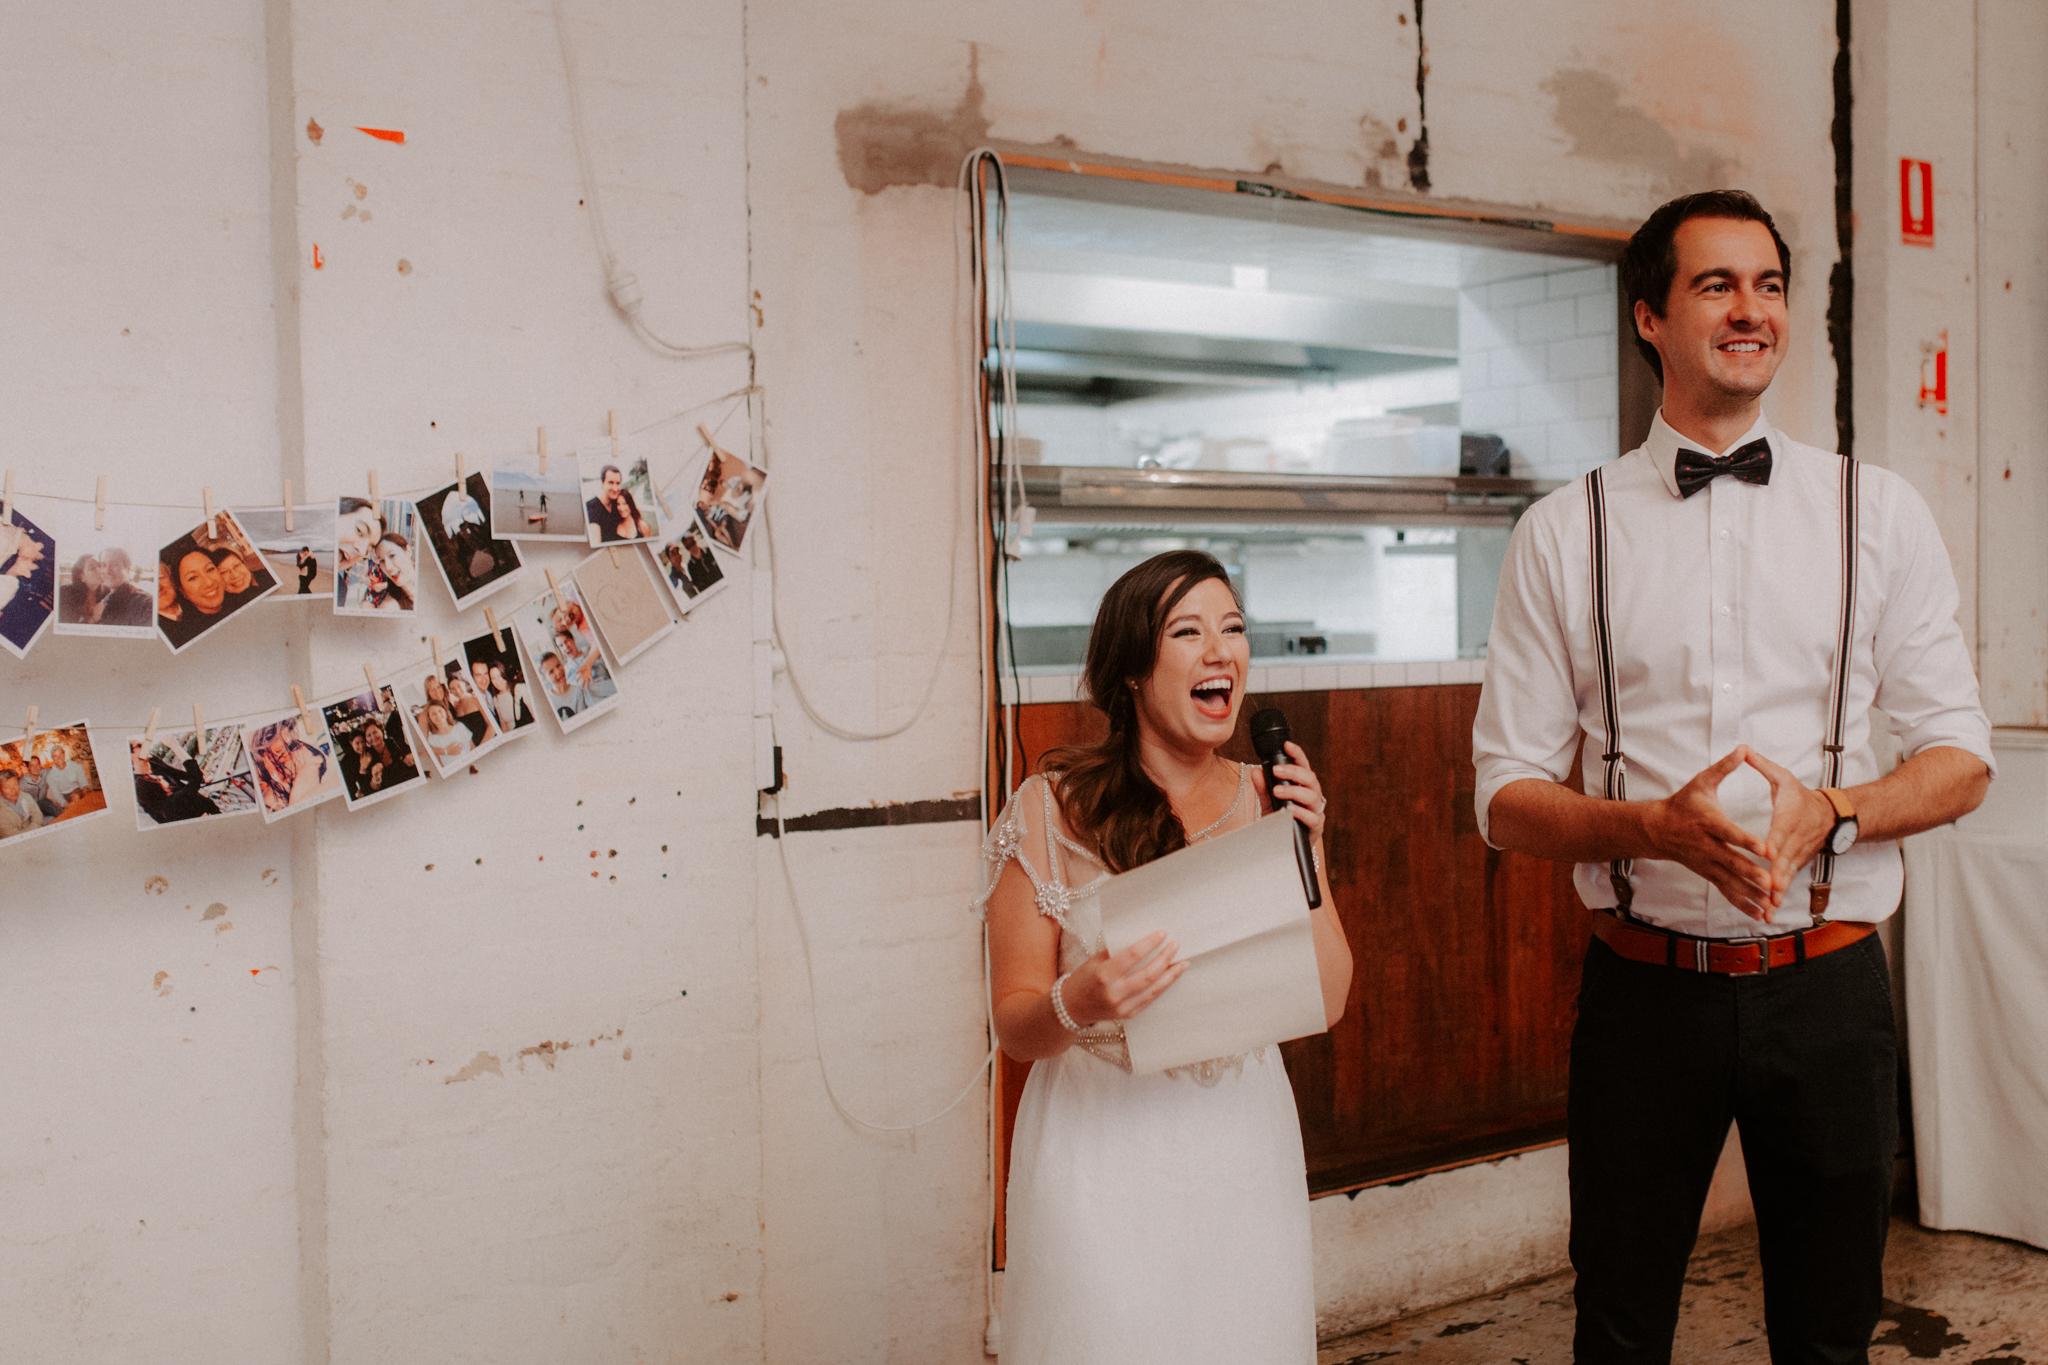 St-Ali-Wedding-Emotions-and-Math-Photography-126.jpg